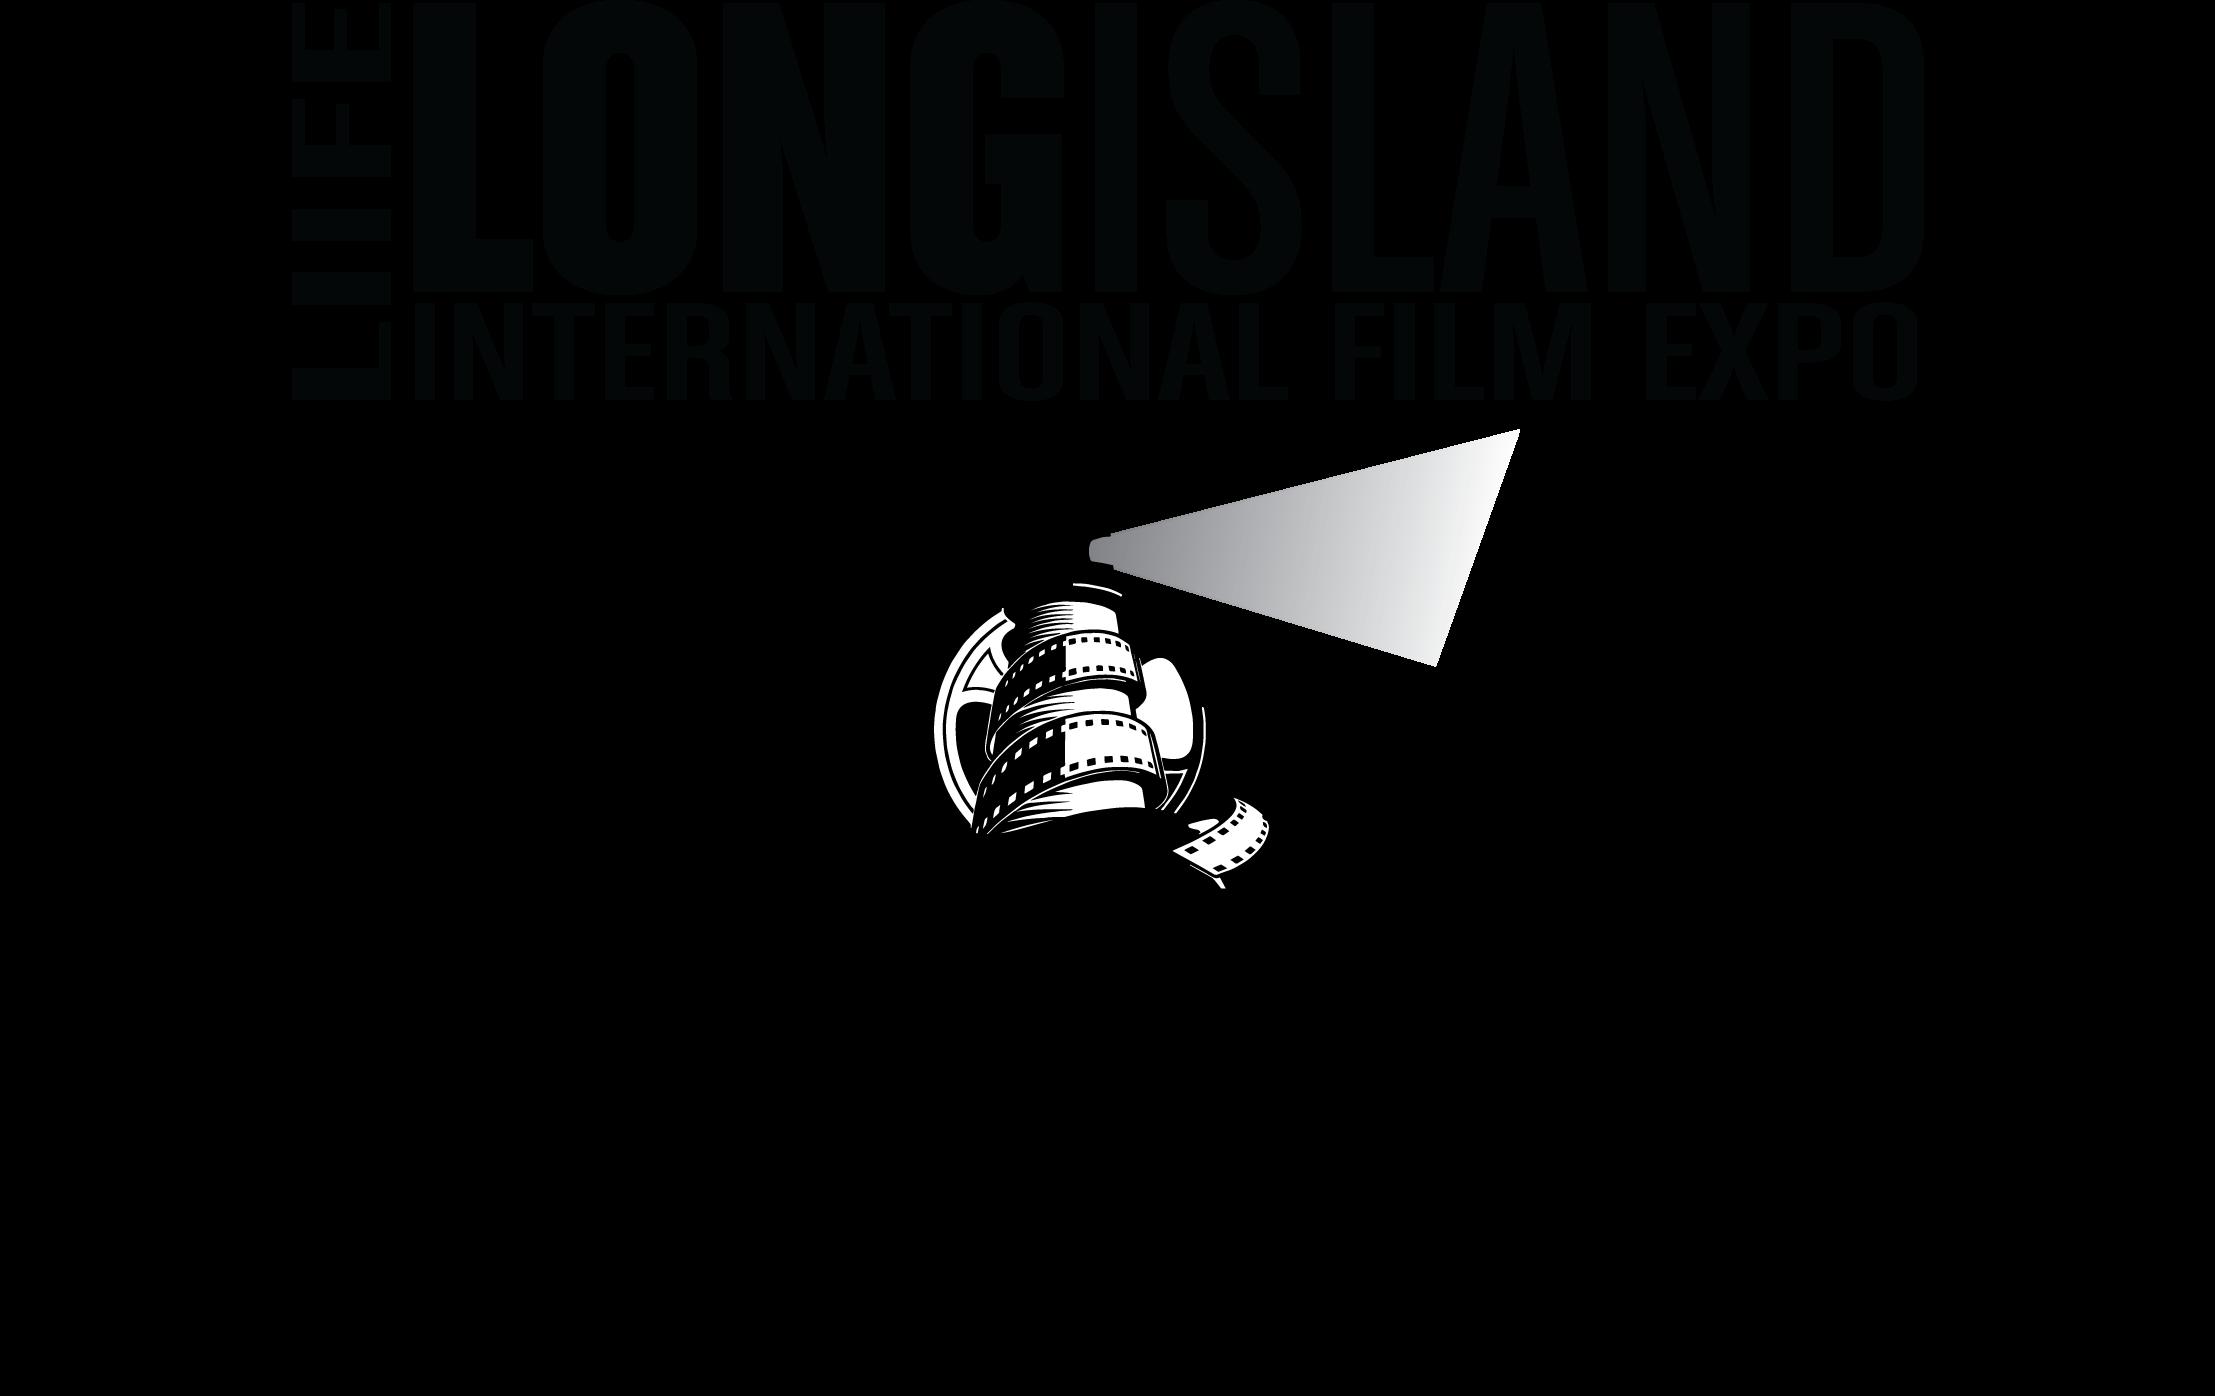 2017-LIIFE-OfficialSelection-LaurelBW.png